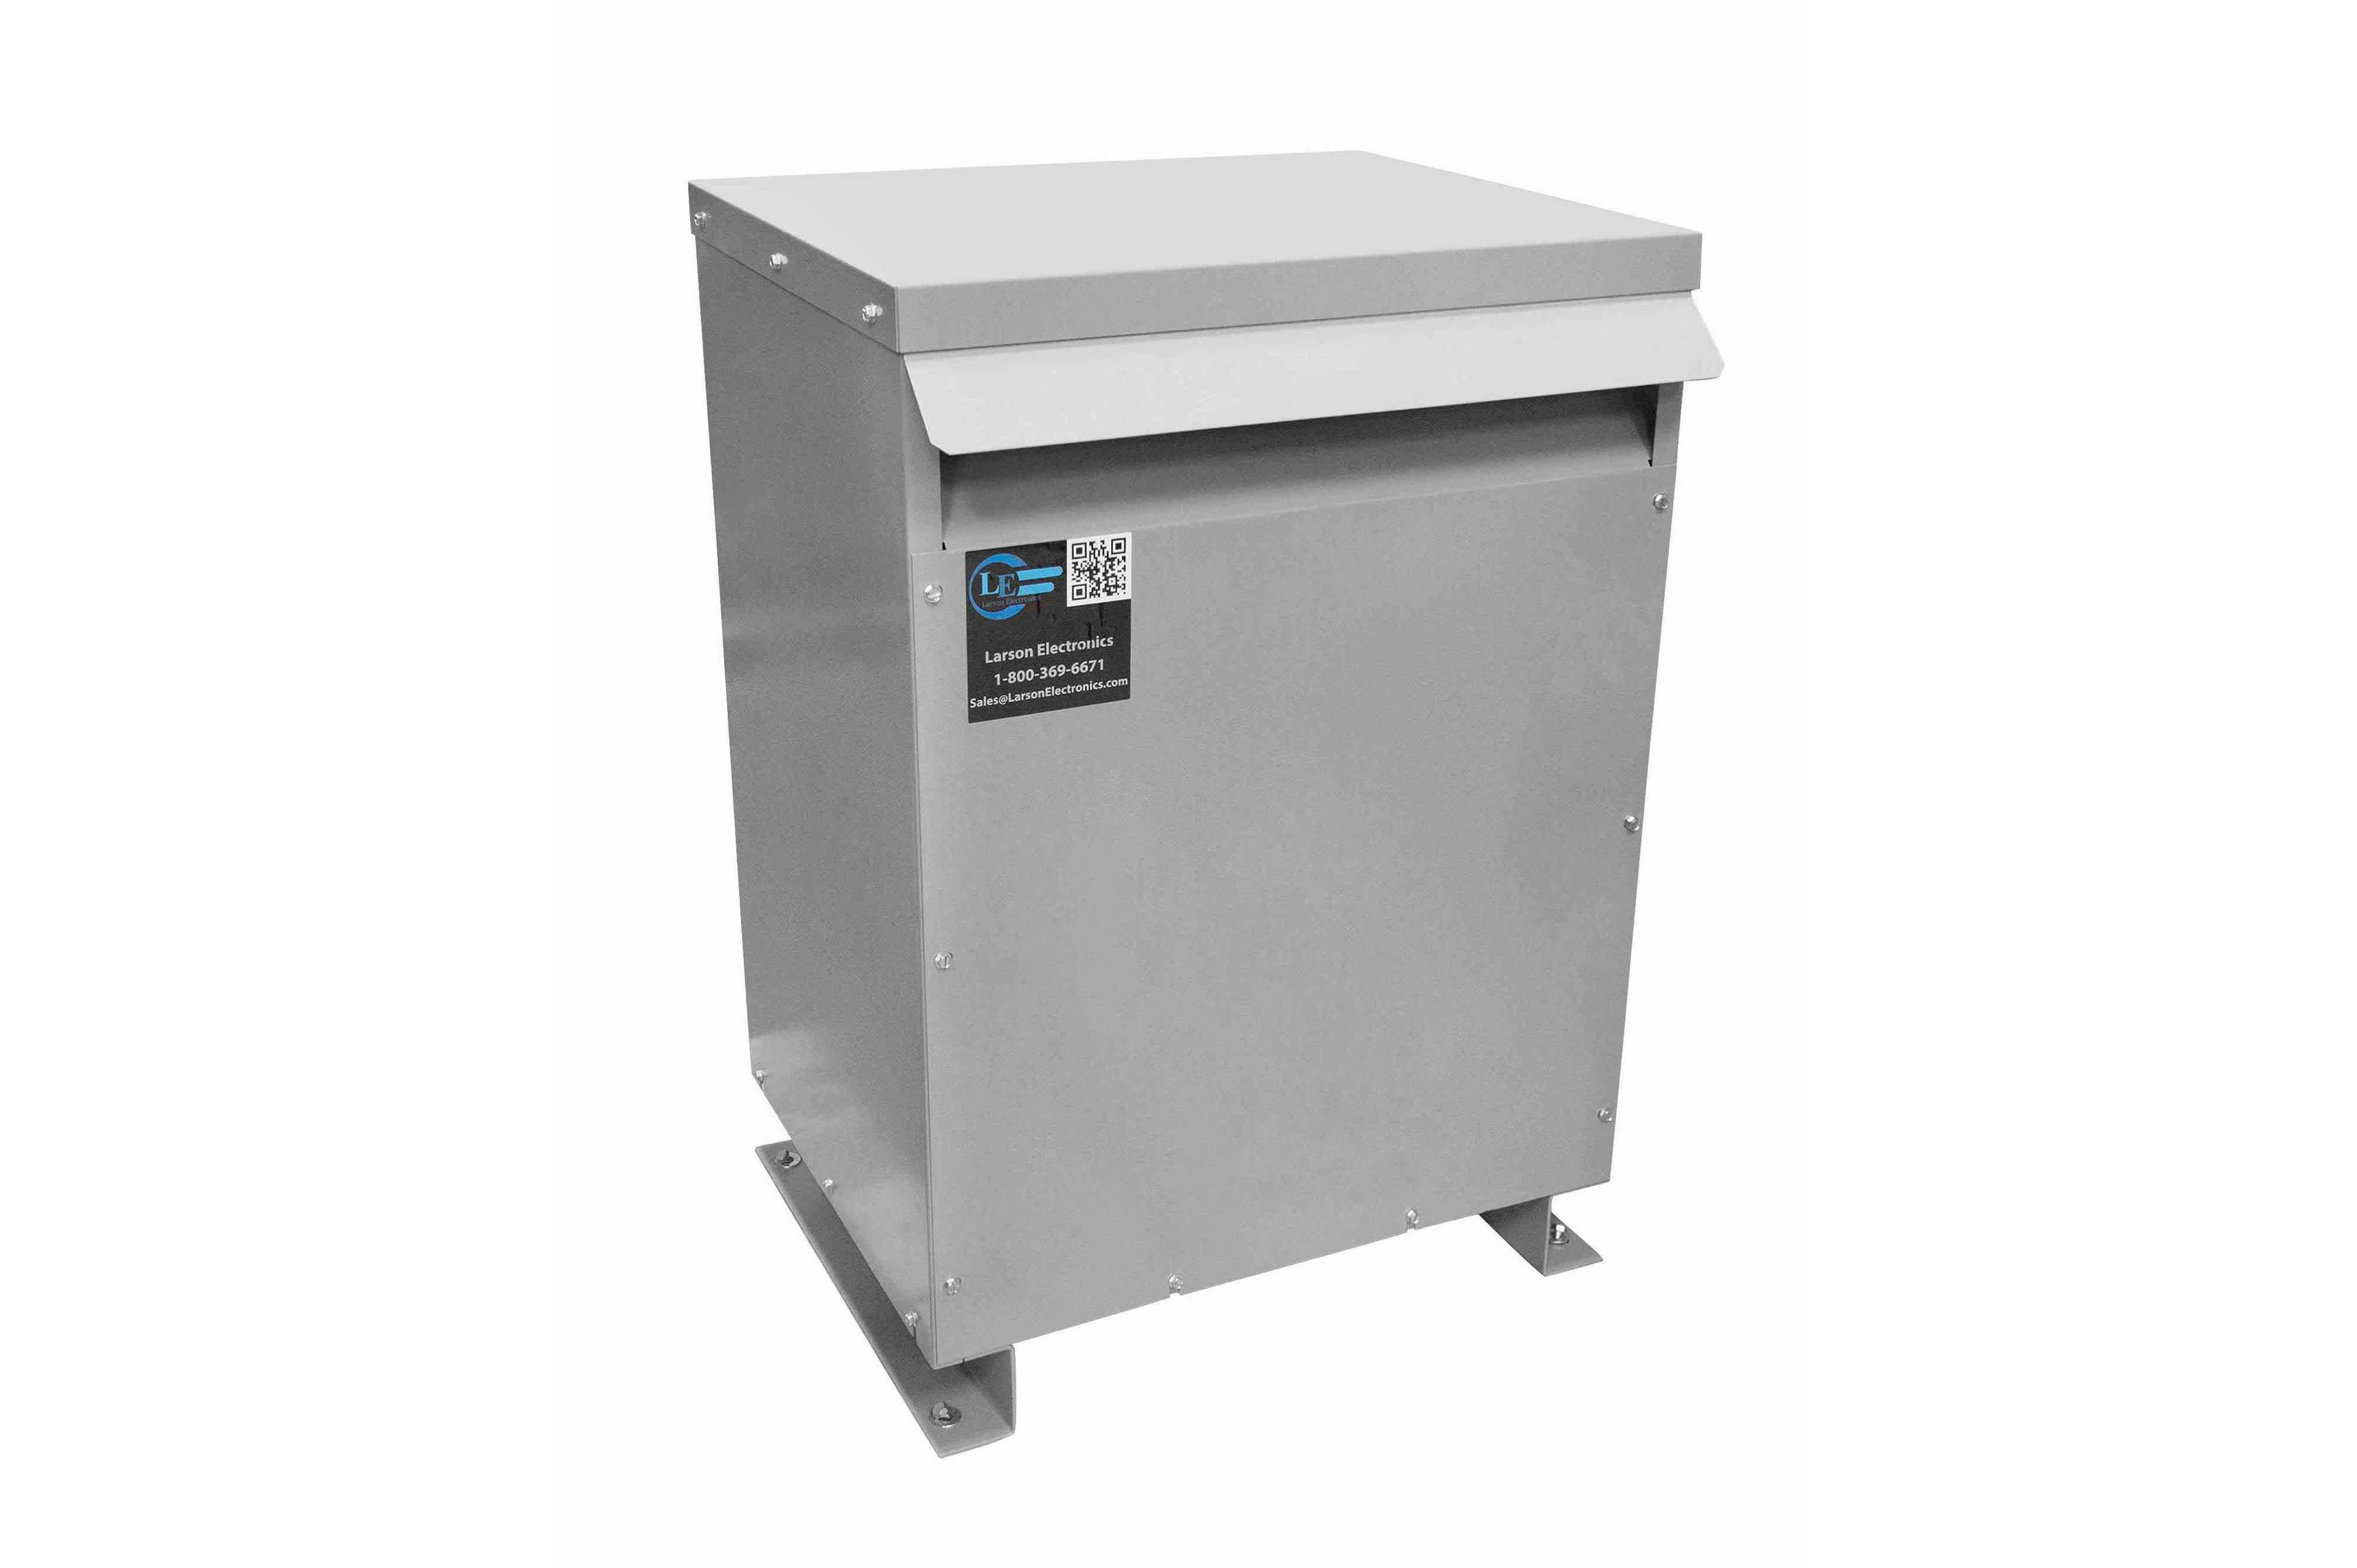 250 kVA 3PH DOE Transformer, 480V Delta Primary, 575Y/332 Wye-N Secondary, N3R, Ventilated, 60 Hz